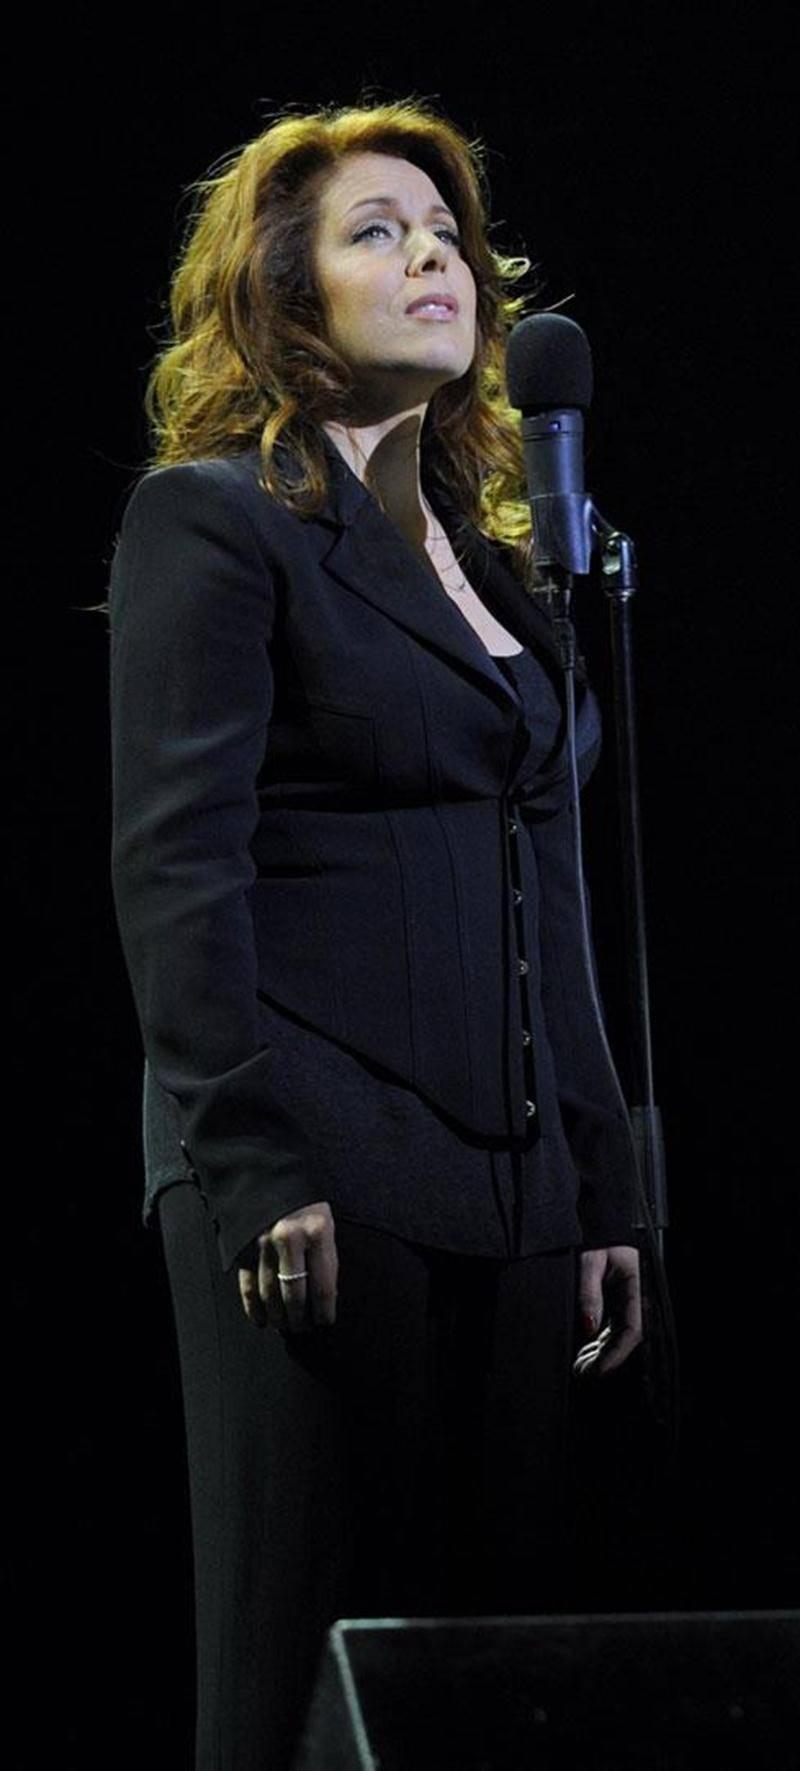 Steffi DiDomenicantonio,Jenilee Harrison born June 12, 1958 (age 60) Sex movies Yassi Pressman (b. 1995),Amy Walsh (actress)